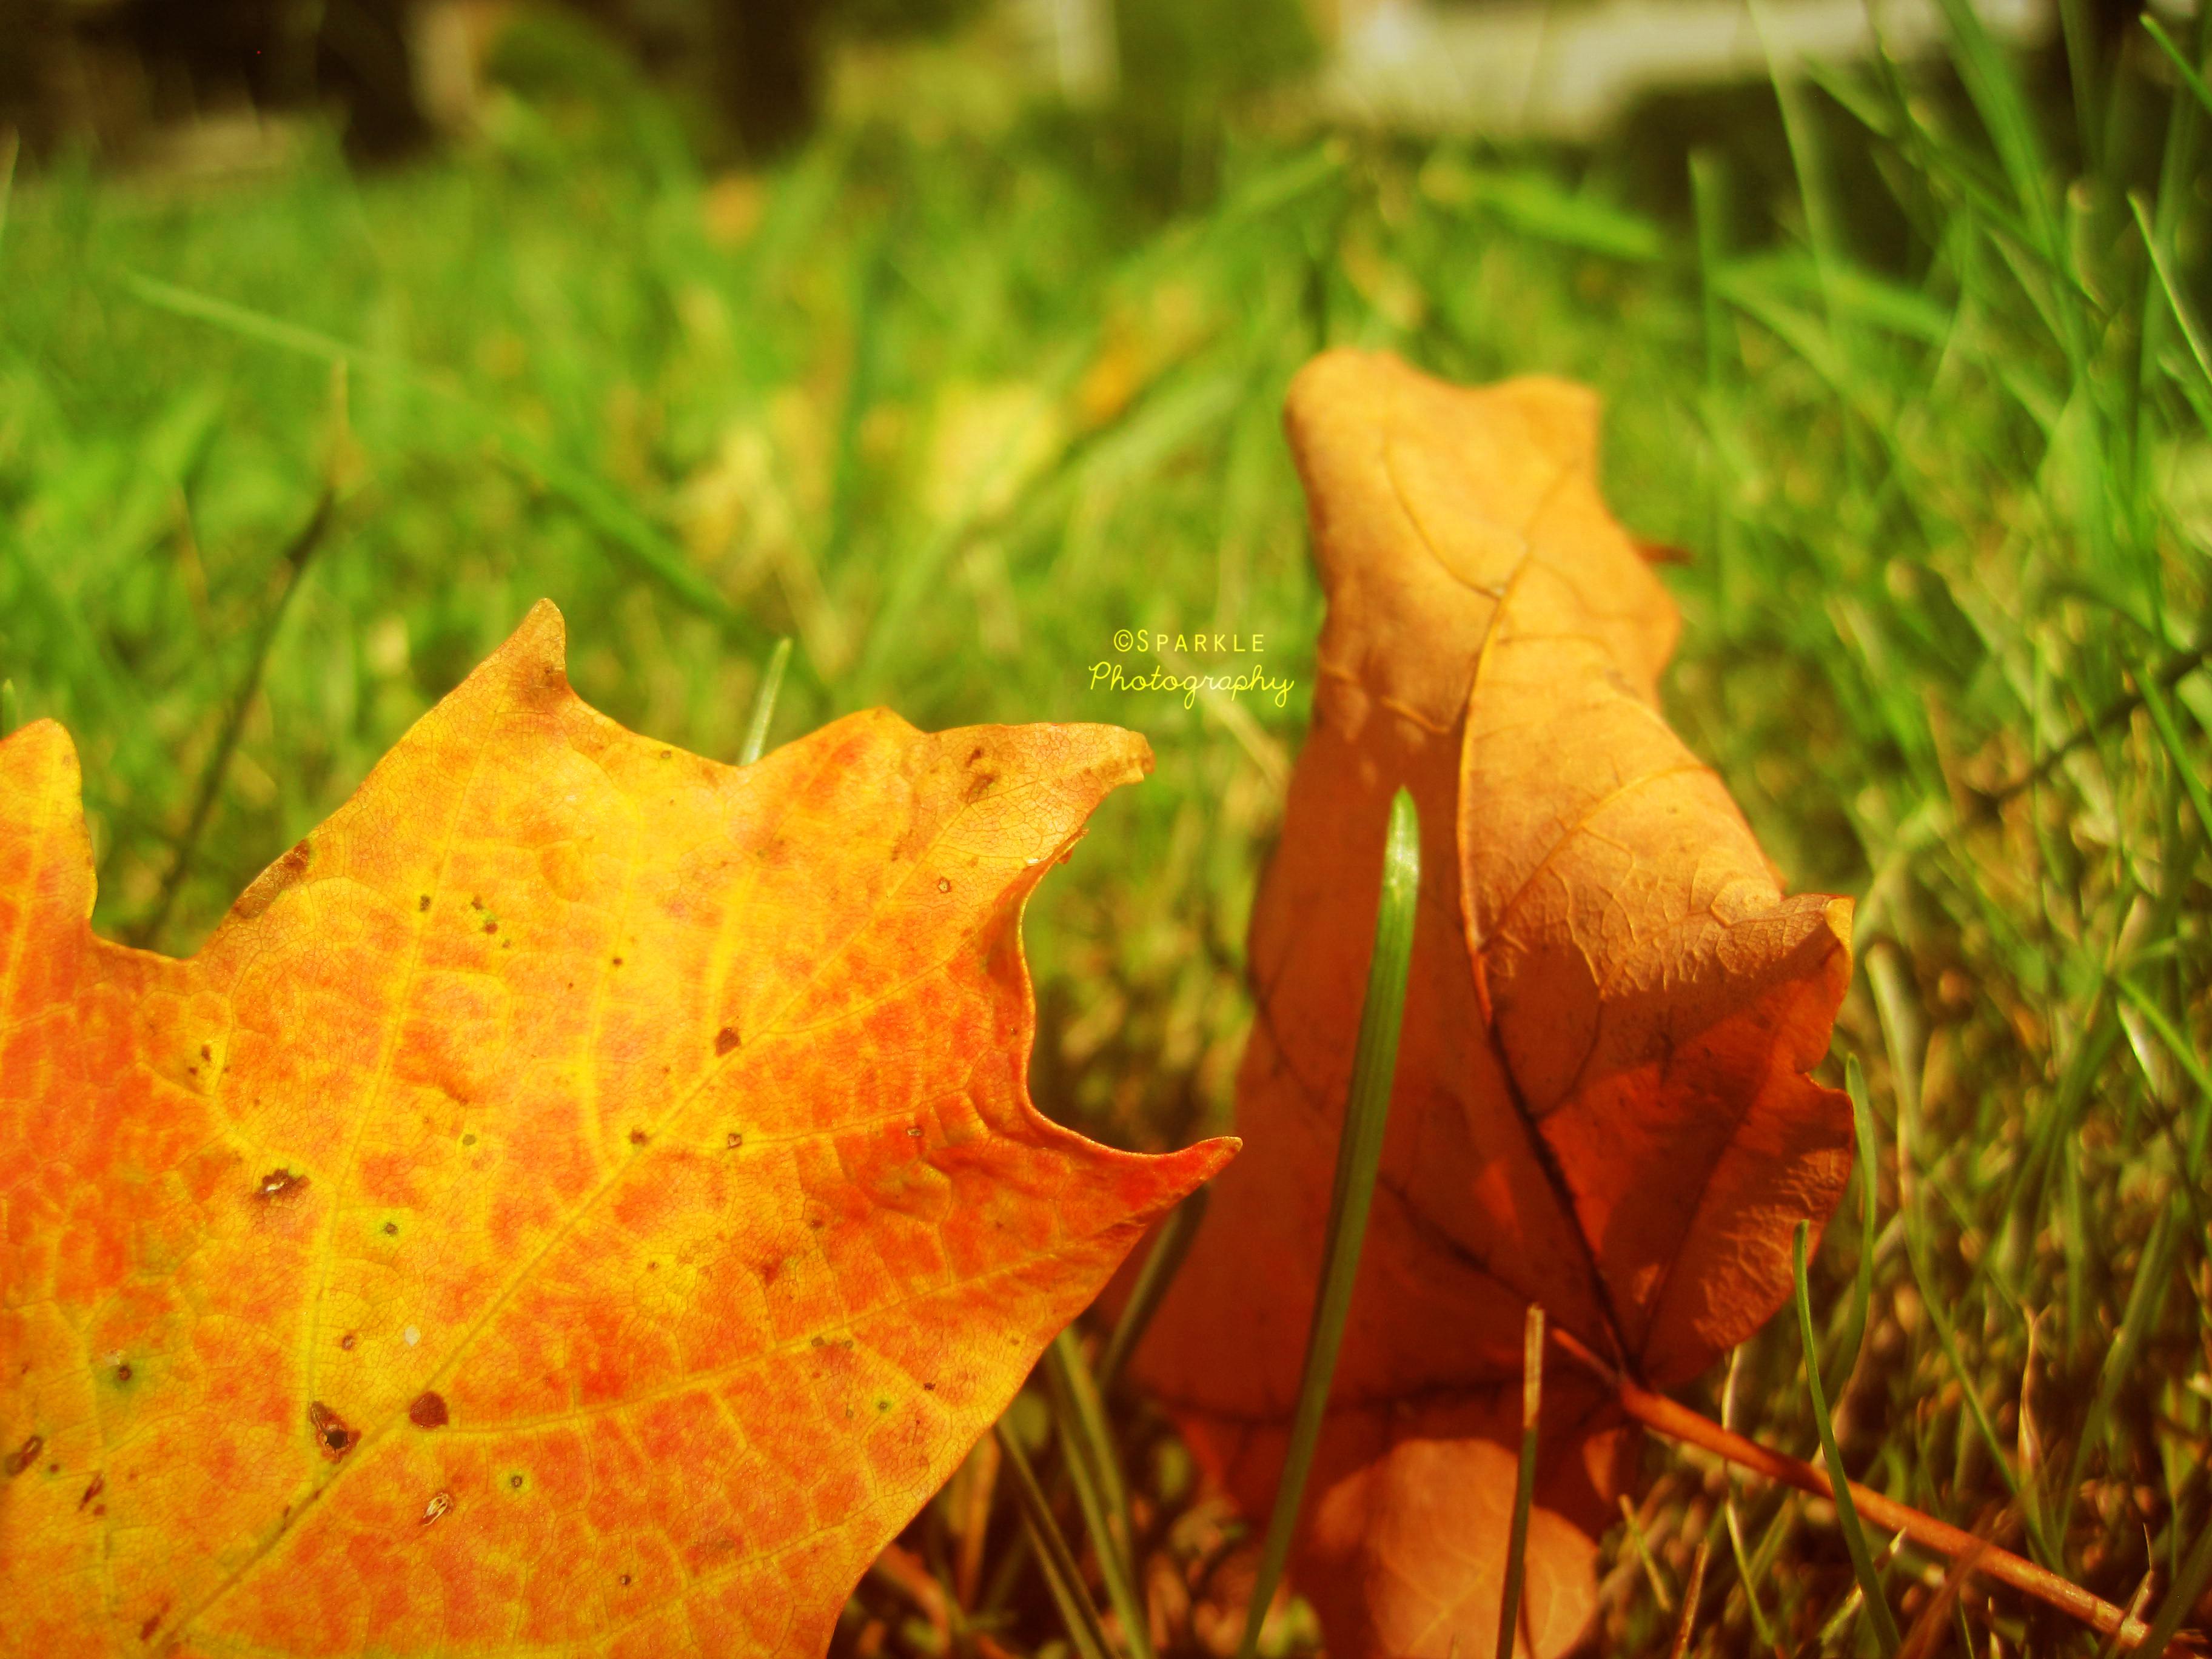 - T h e  C o l o r  O f  F a l l - by Sparkle-Photography